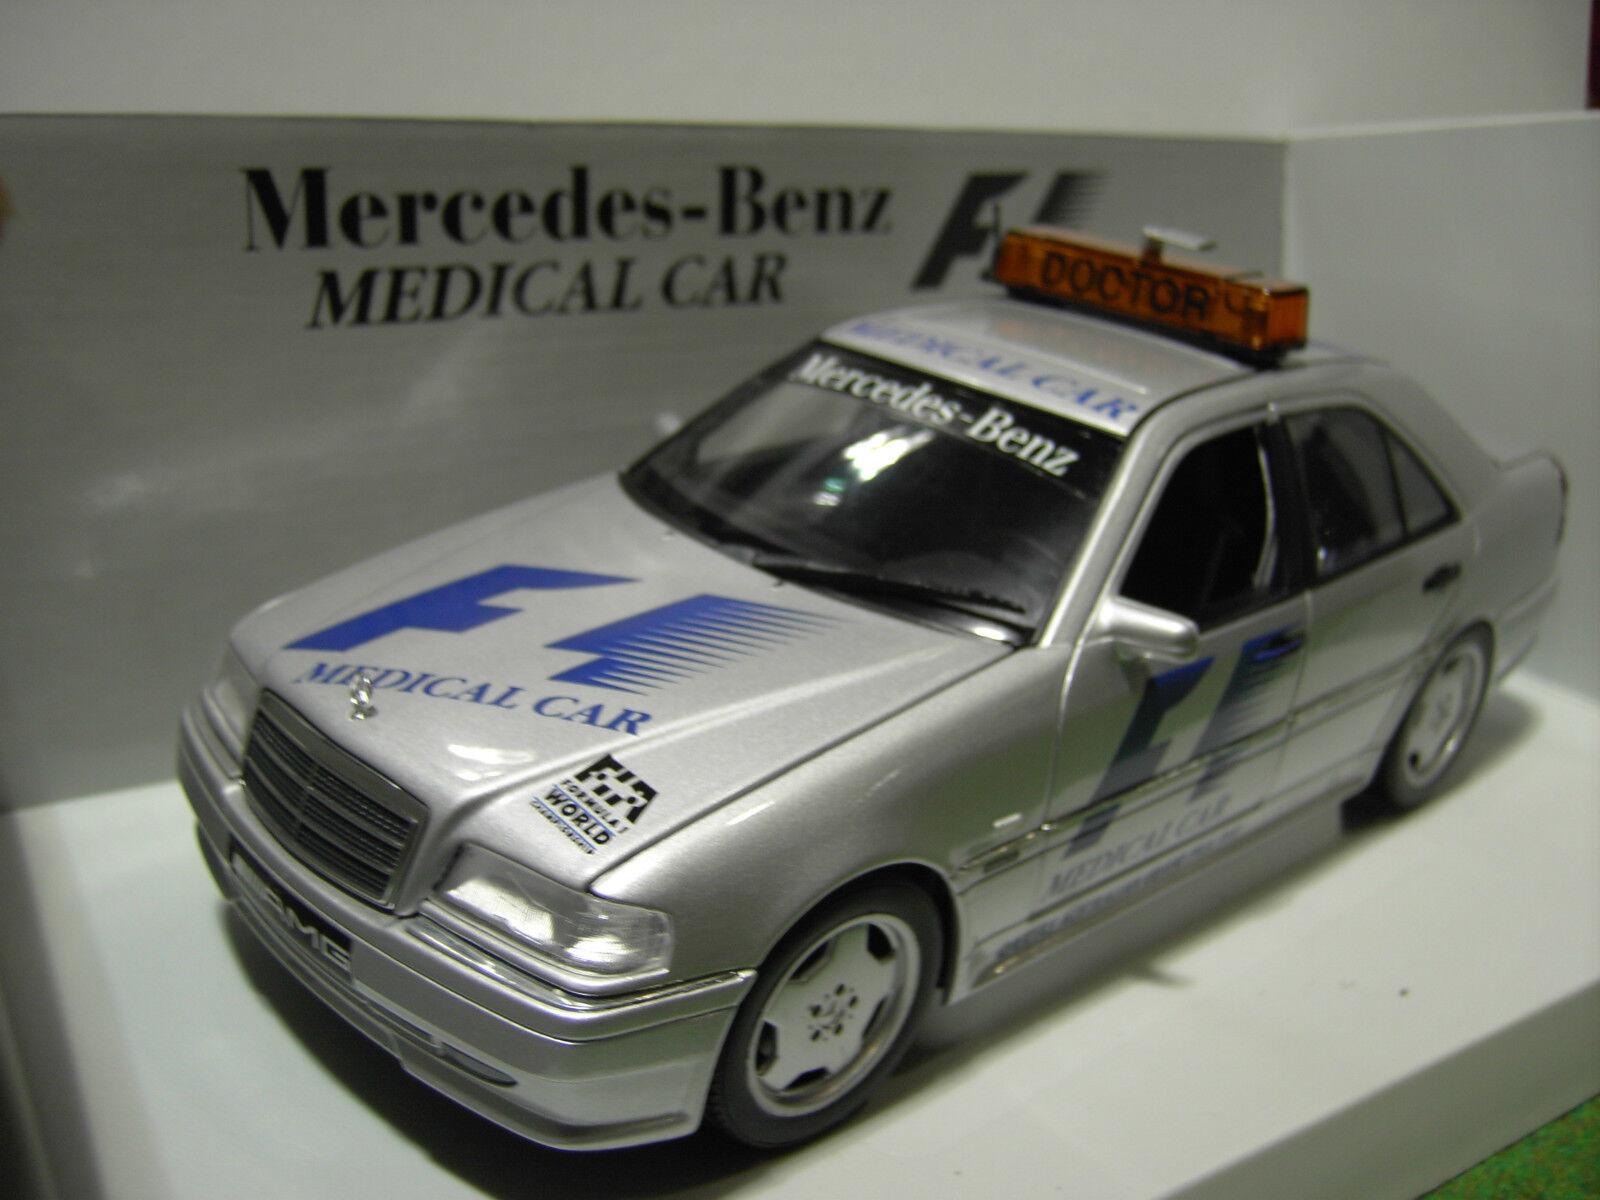 MERCEDES BENZ C CLASS AMG MEDICAL CAR au 1 18 UT Models 26106 voiture miniature